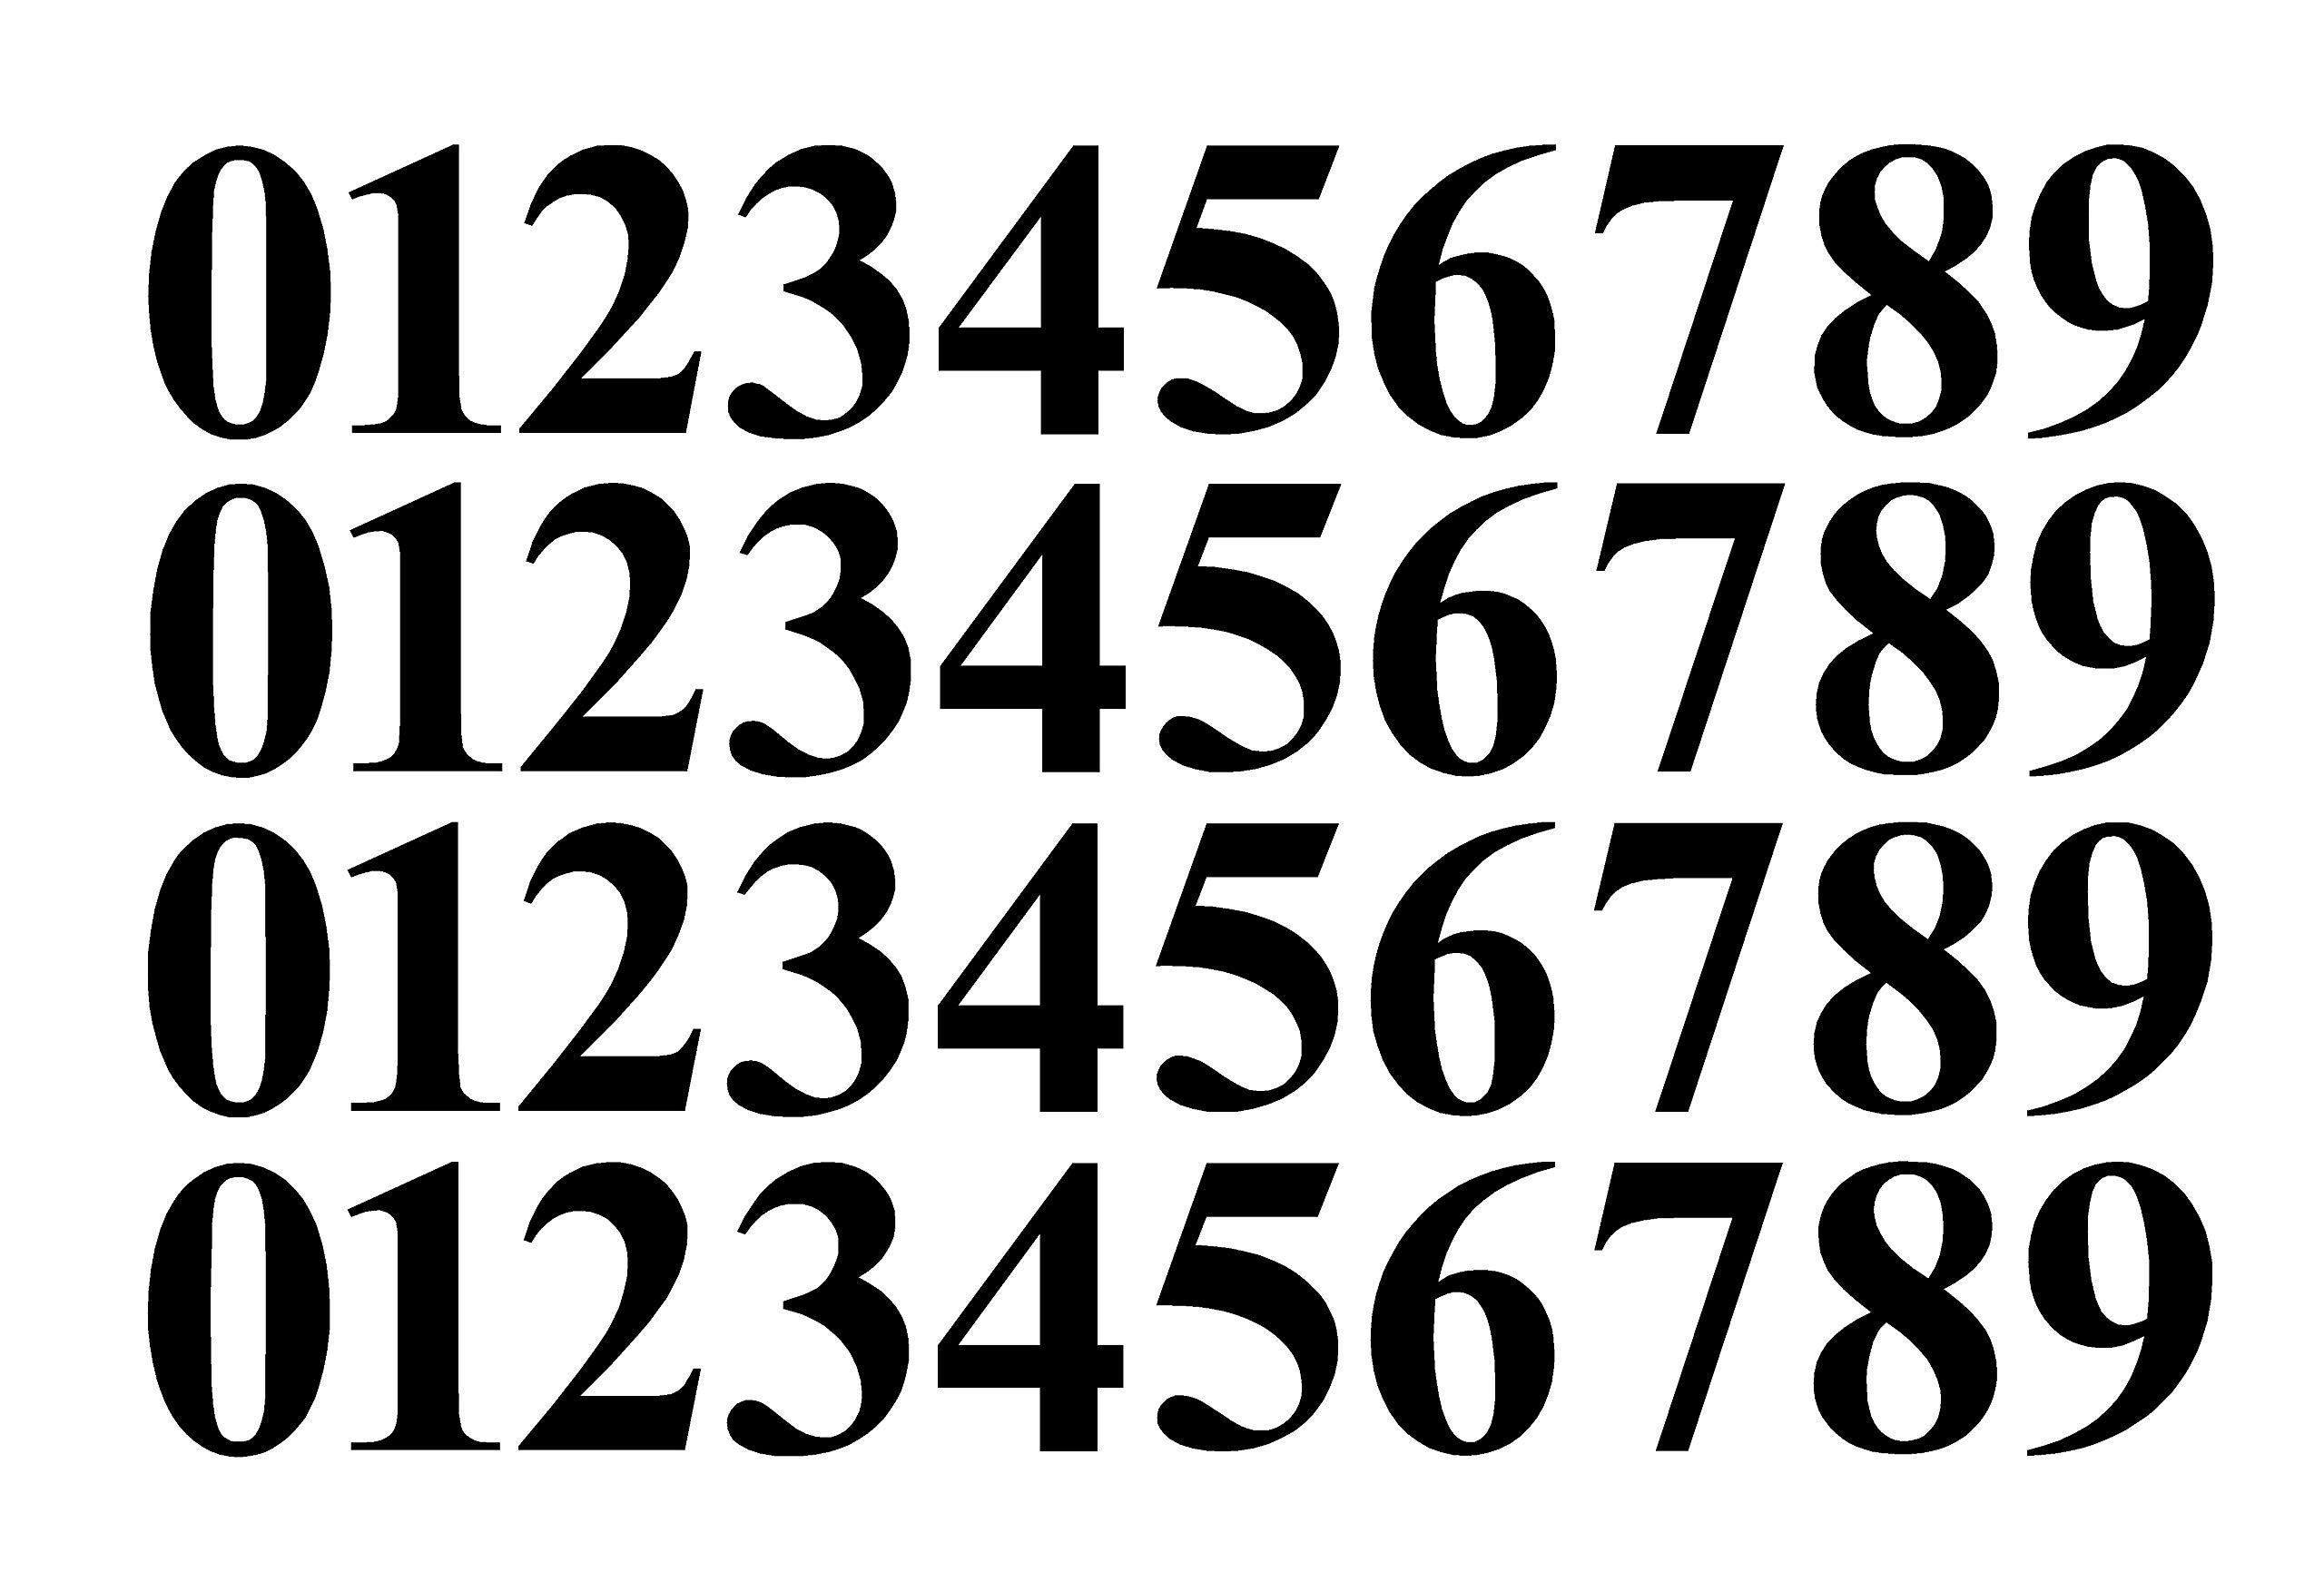 Five Star Graphics 0-9 Numbers Matte Black Vinyl Sticker Decals Assorted Set of 40 Choose Size!! 1/2'' to 12'' (V646MatteBlkTimes) (10'')